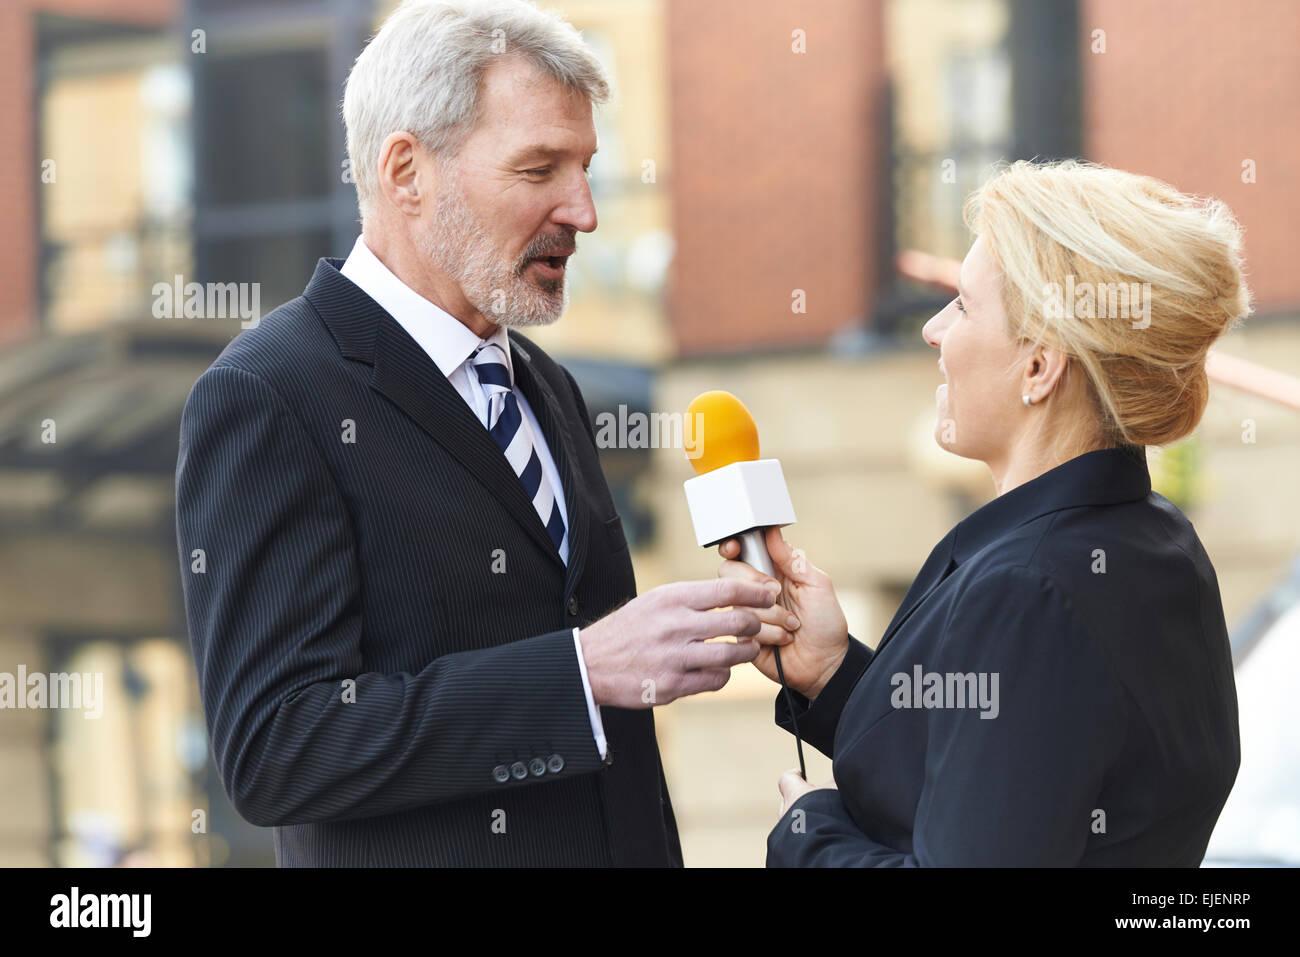 Cameraman Recording Female Journalist Interviewing Businessman - Stock Image